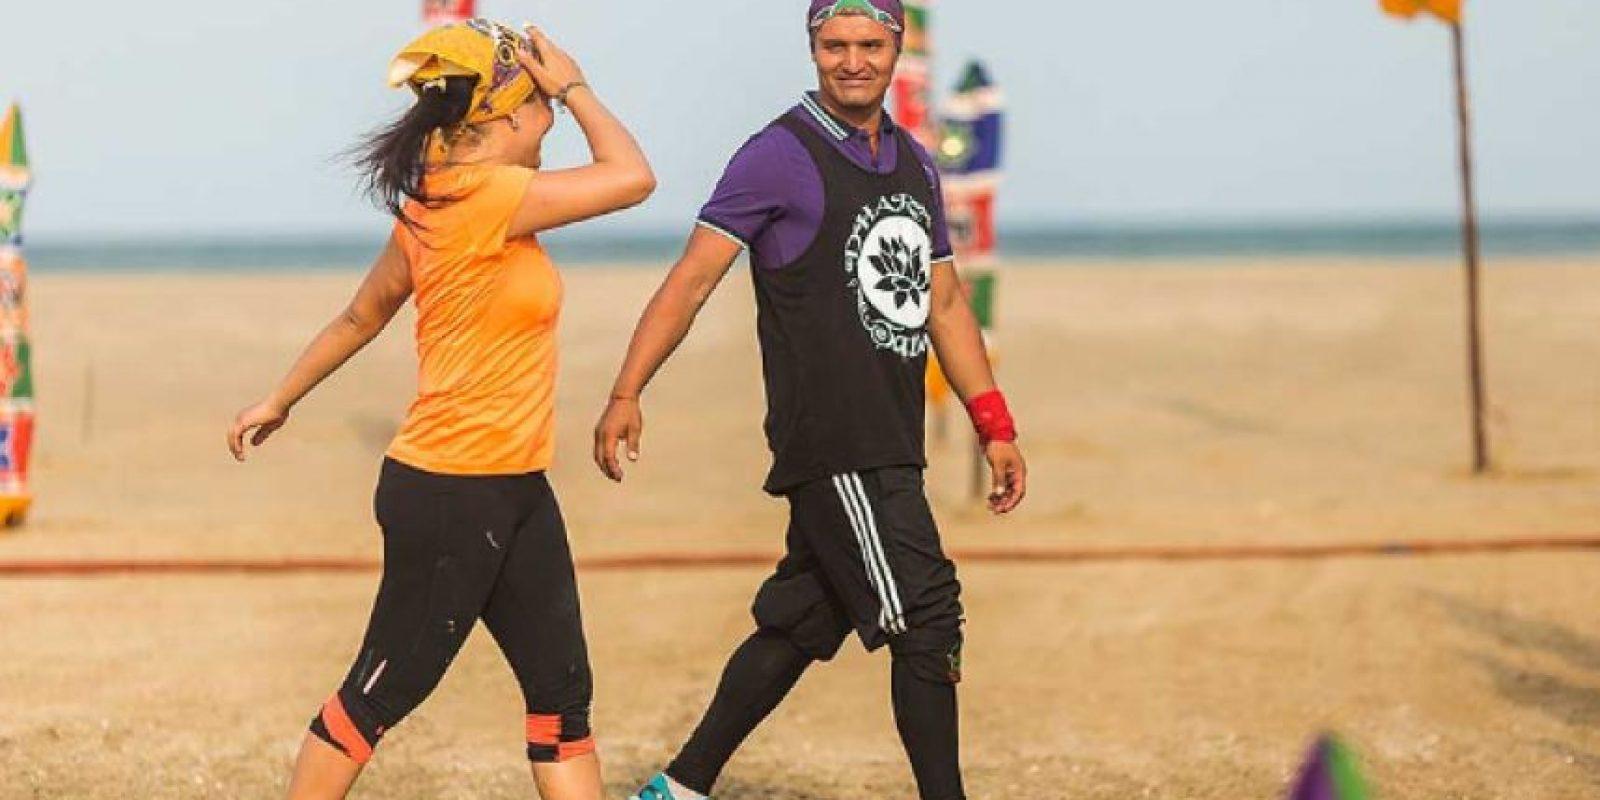 Hassam en el desafió India 2015 Foto:Caracol Televisión